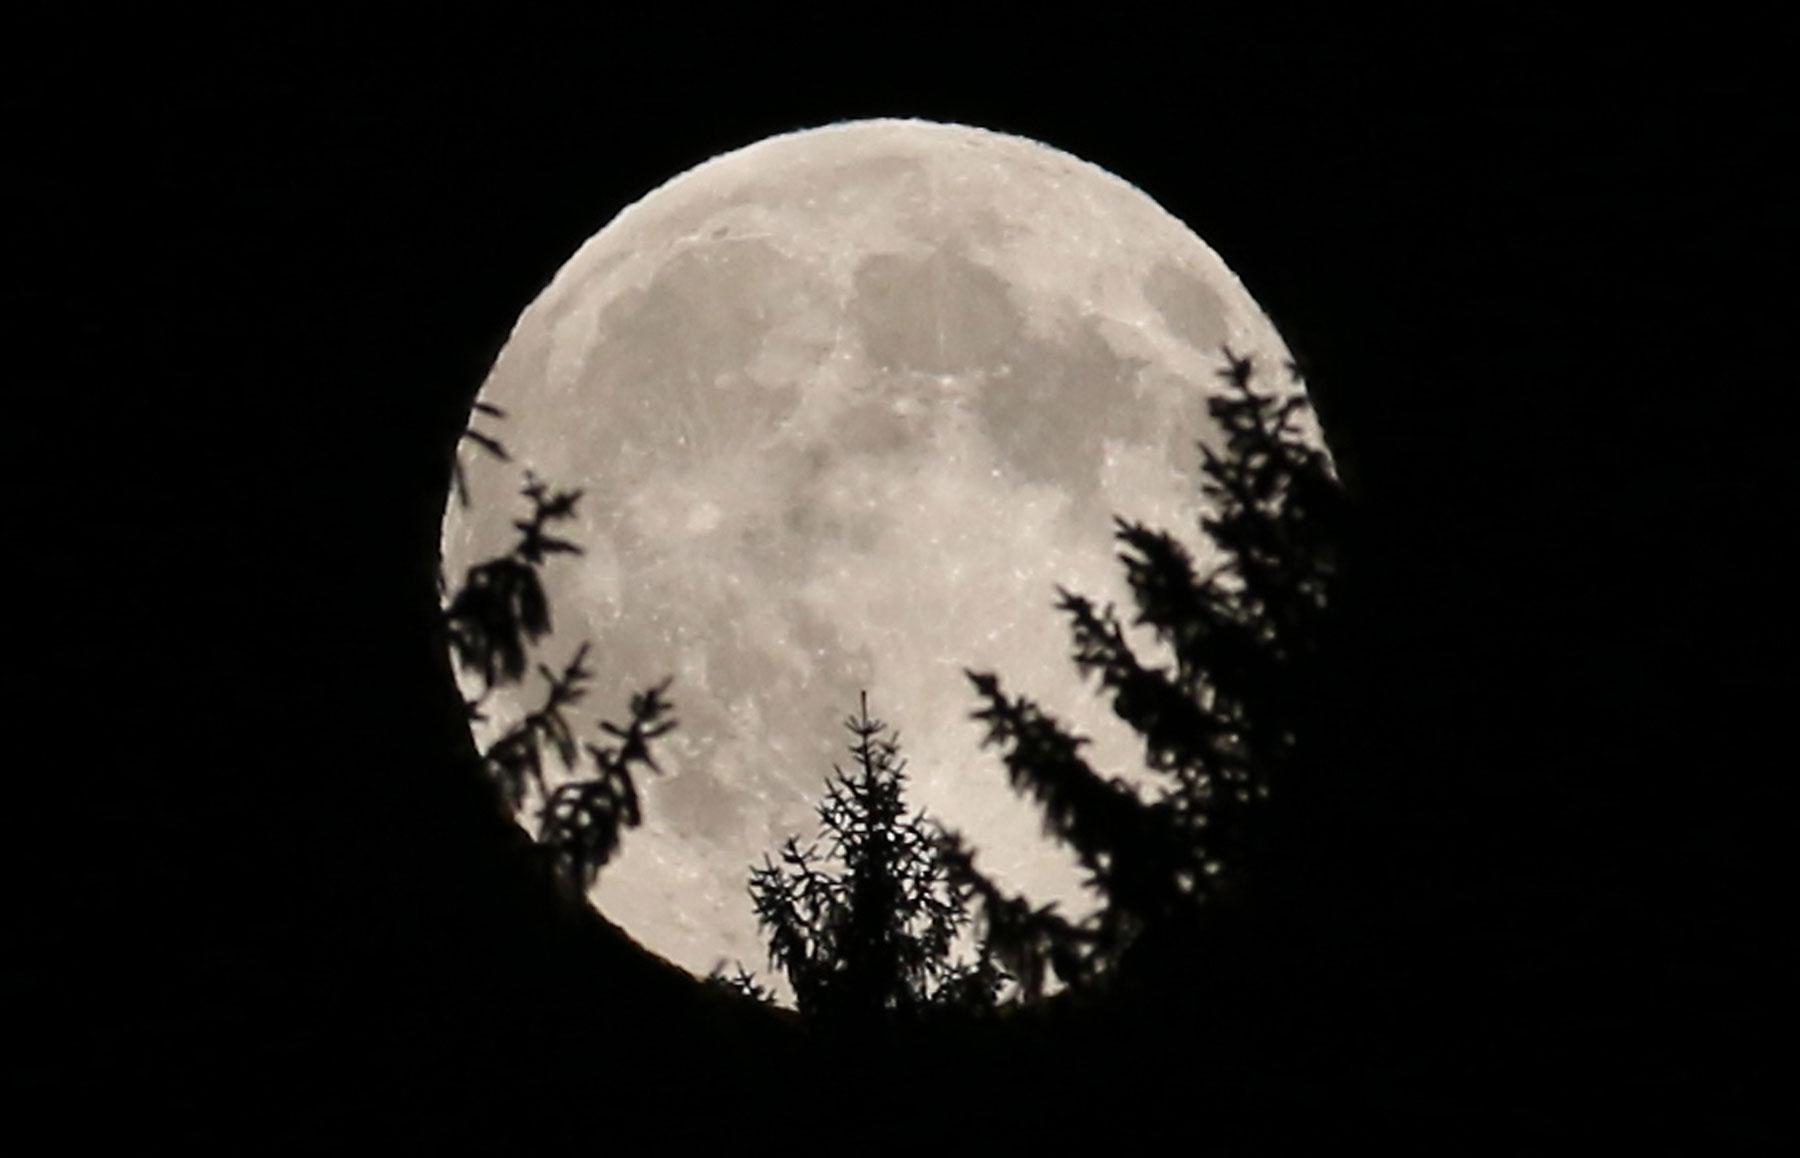 Saturday is 'International Observe the Moon Night'